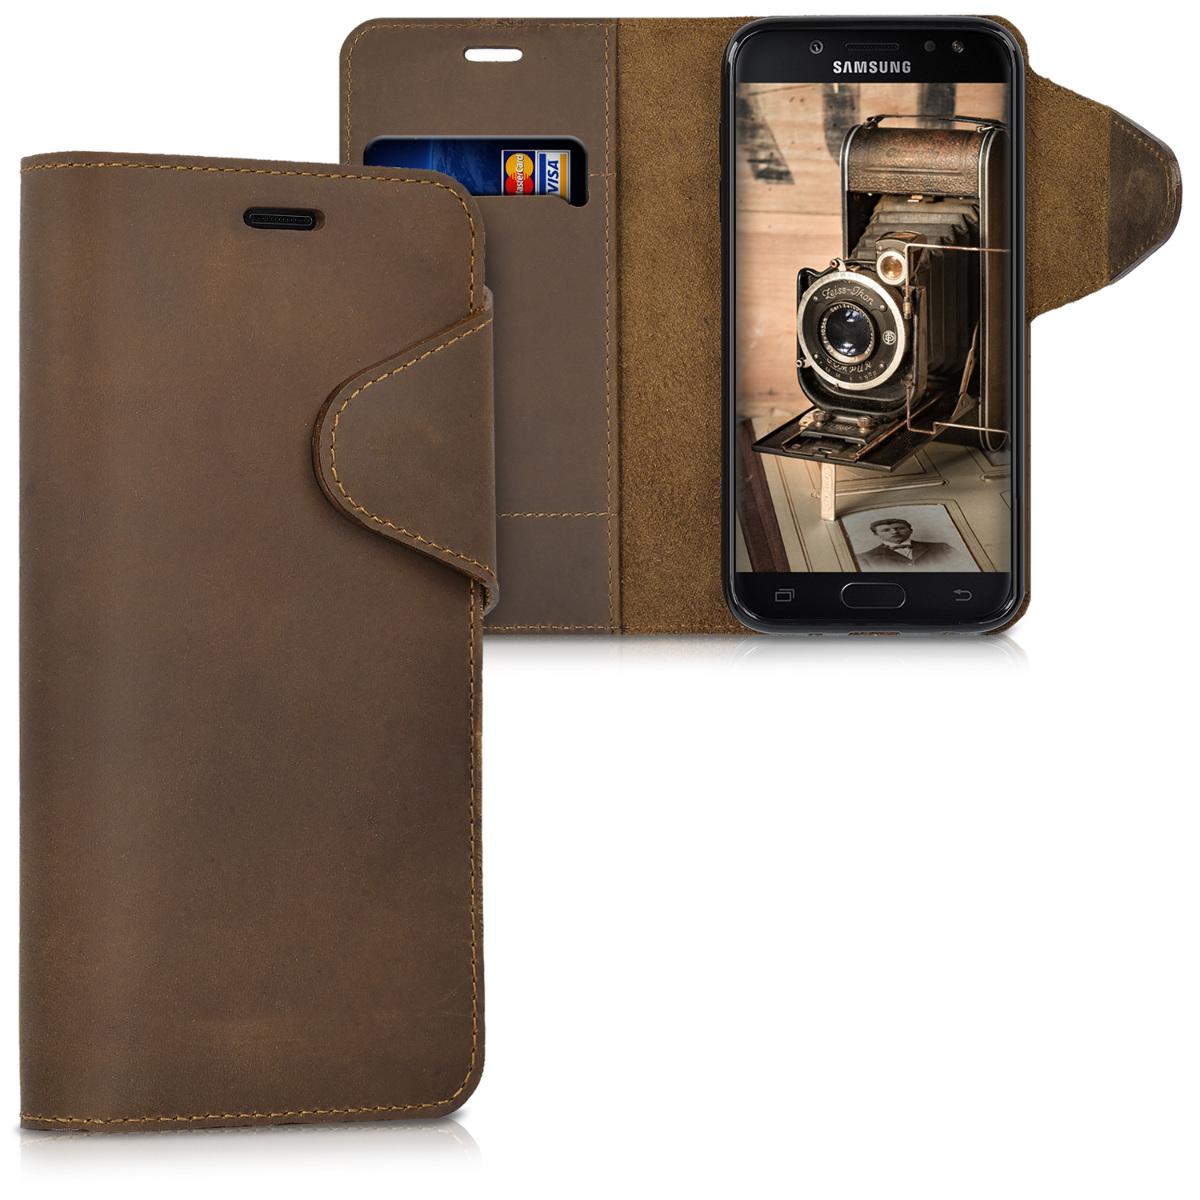 Kalibri Δερμάτινη Suede Θήκη - Πορτοφόλι Samsung Galaxy J5 (2017) DUOS - Brown (41146.05)